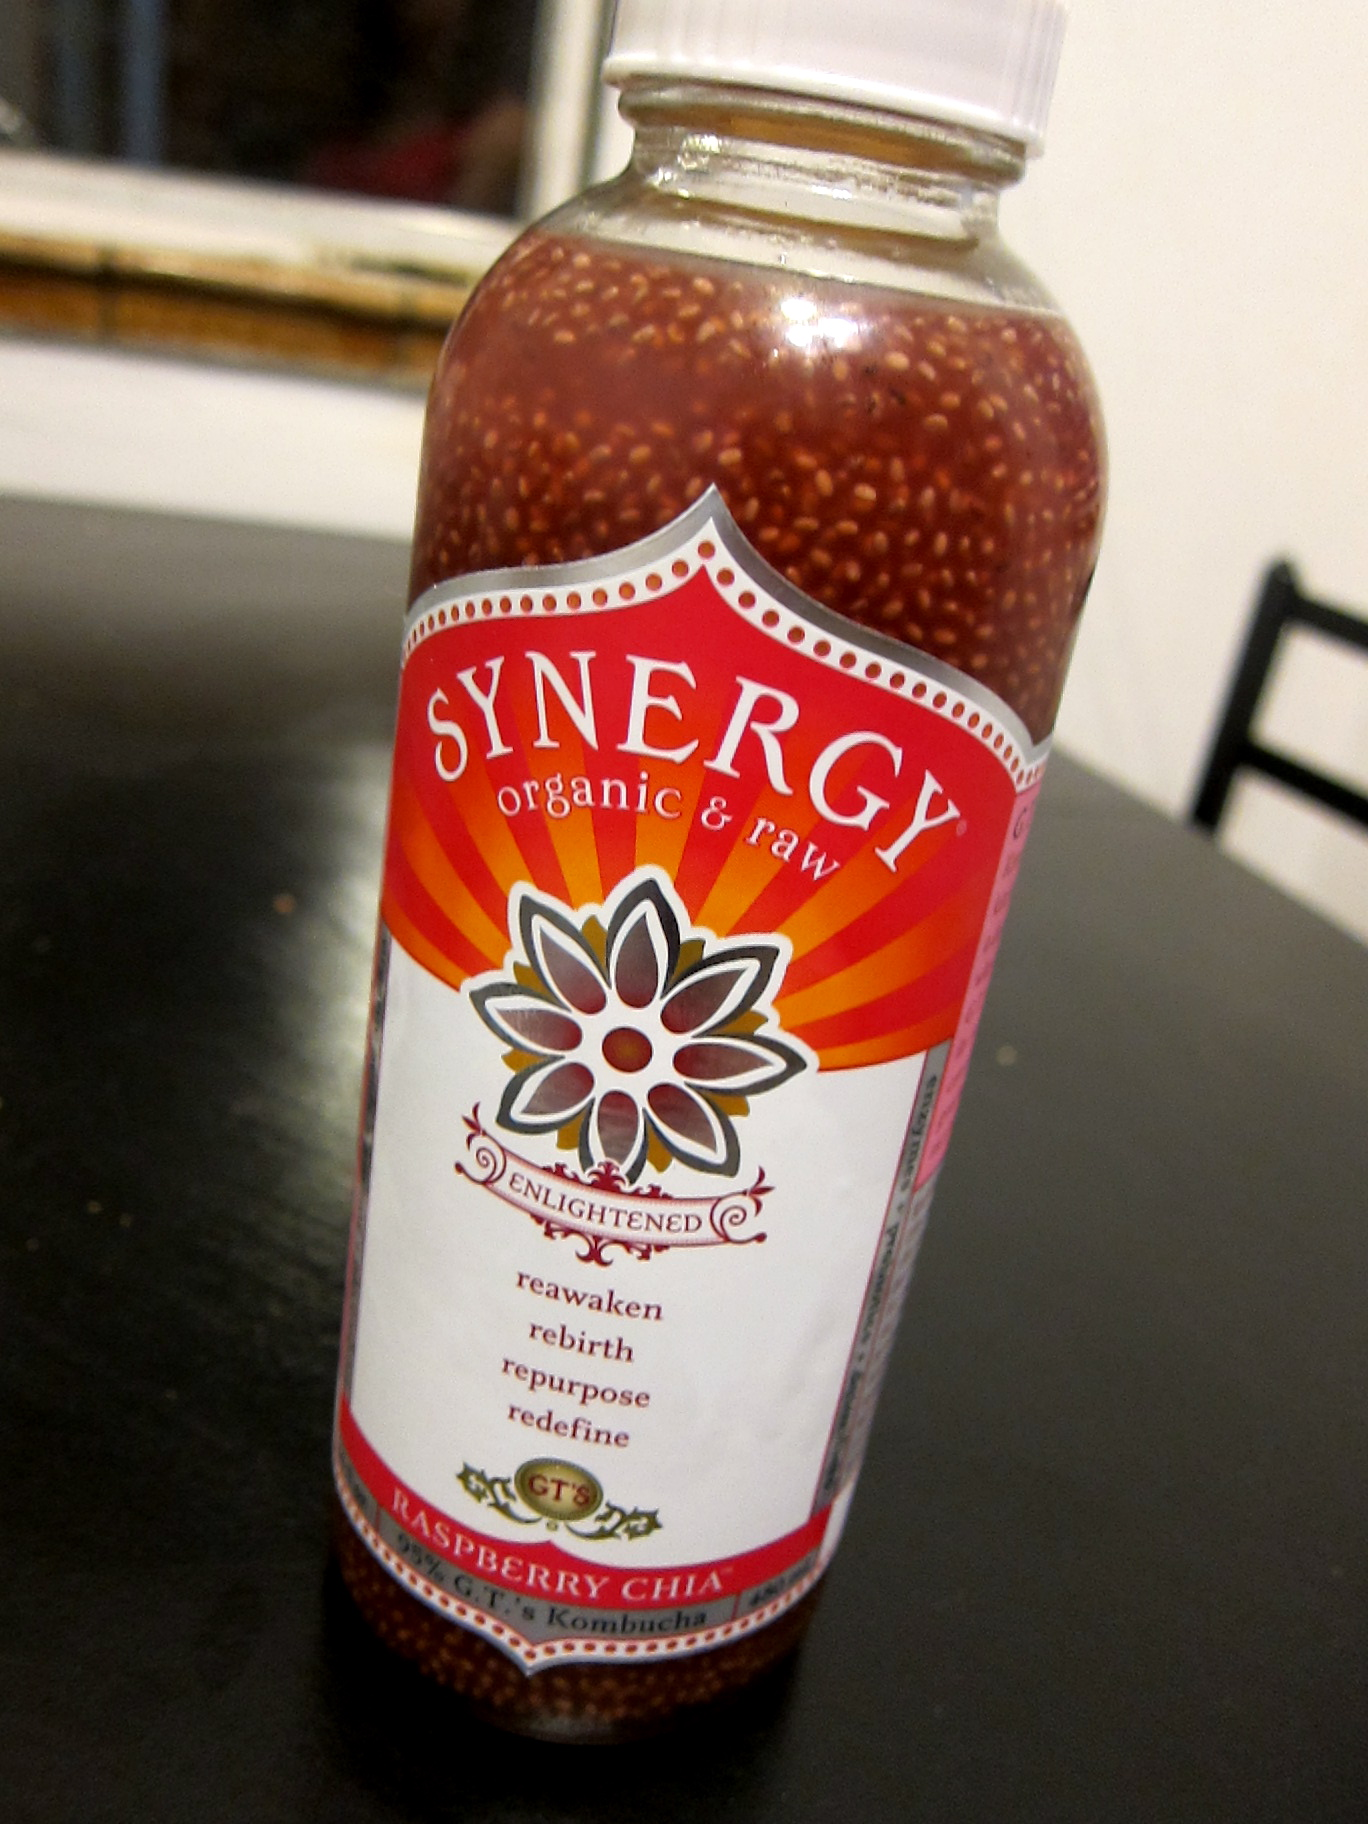 Synergy Drink